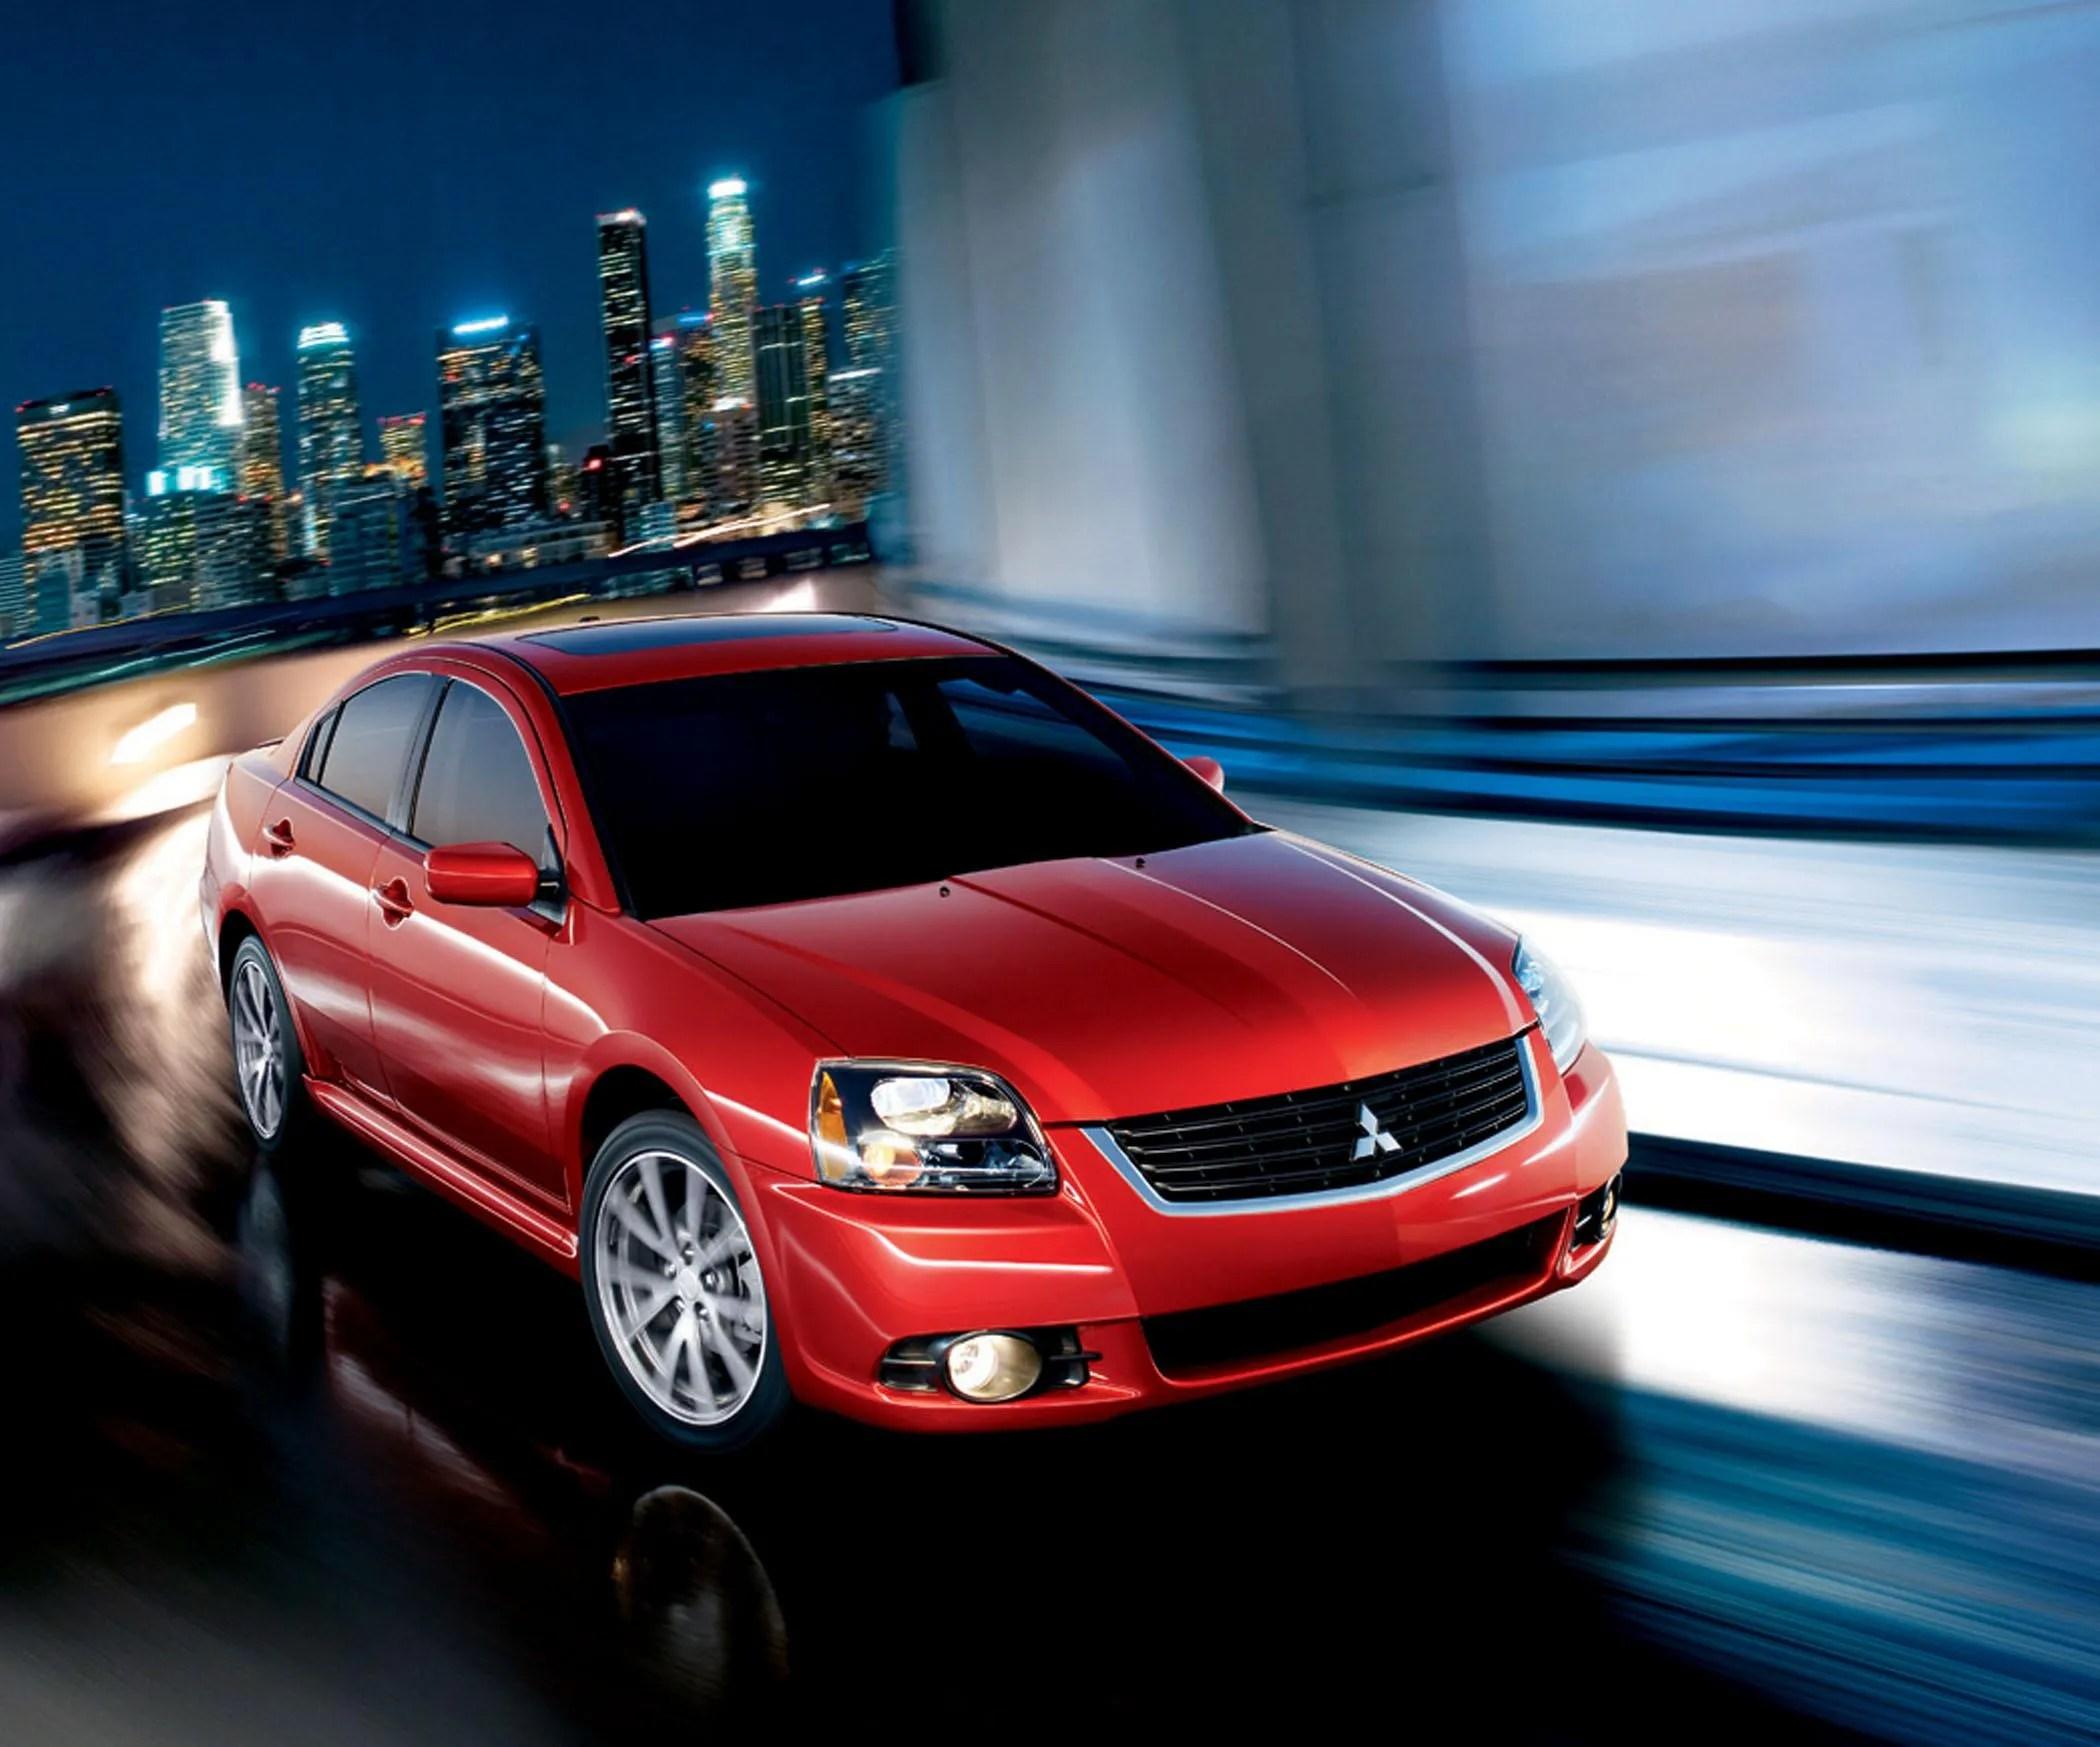 2009 Mitsubishi Galant Top Speed